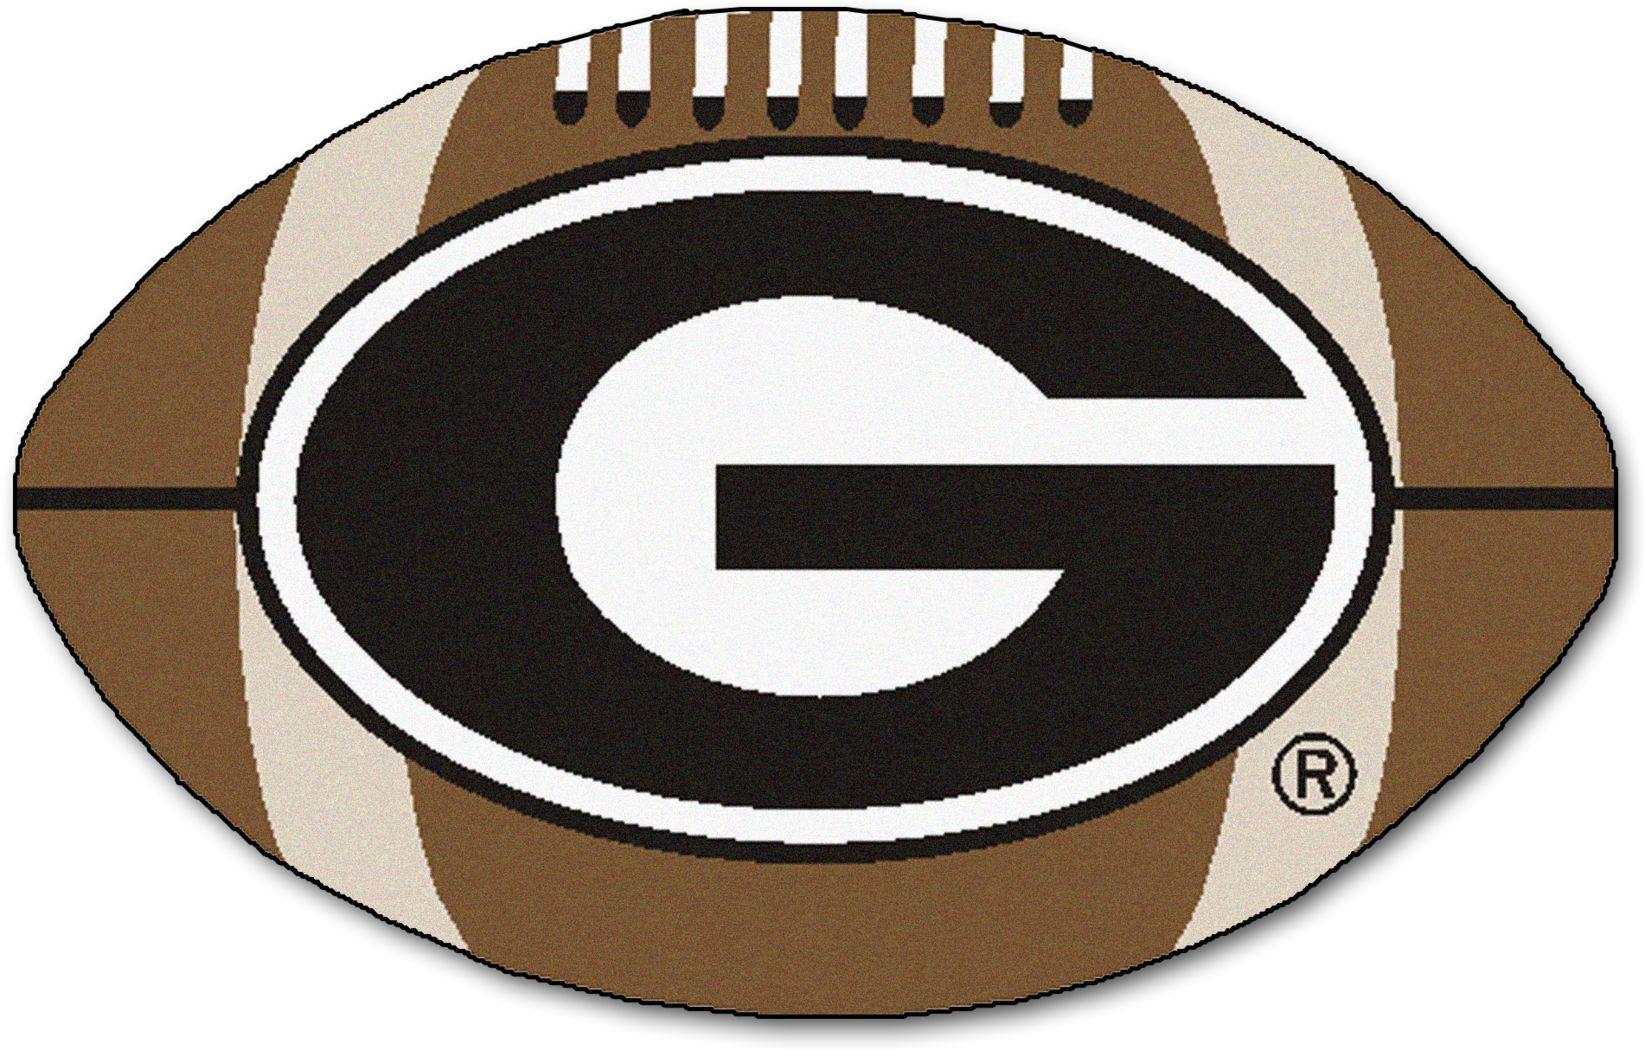 NCAA Football Mascot University of Georgia 1'6 x 1'10 Rug